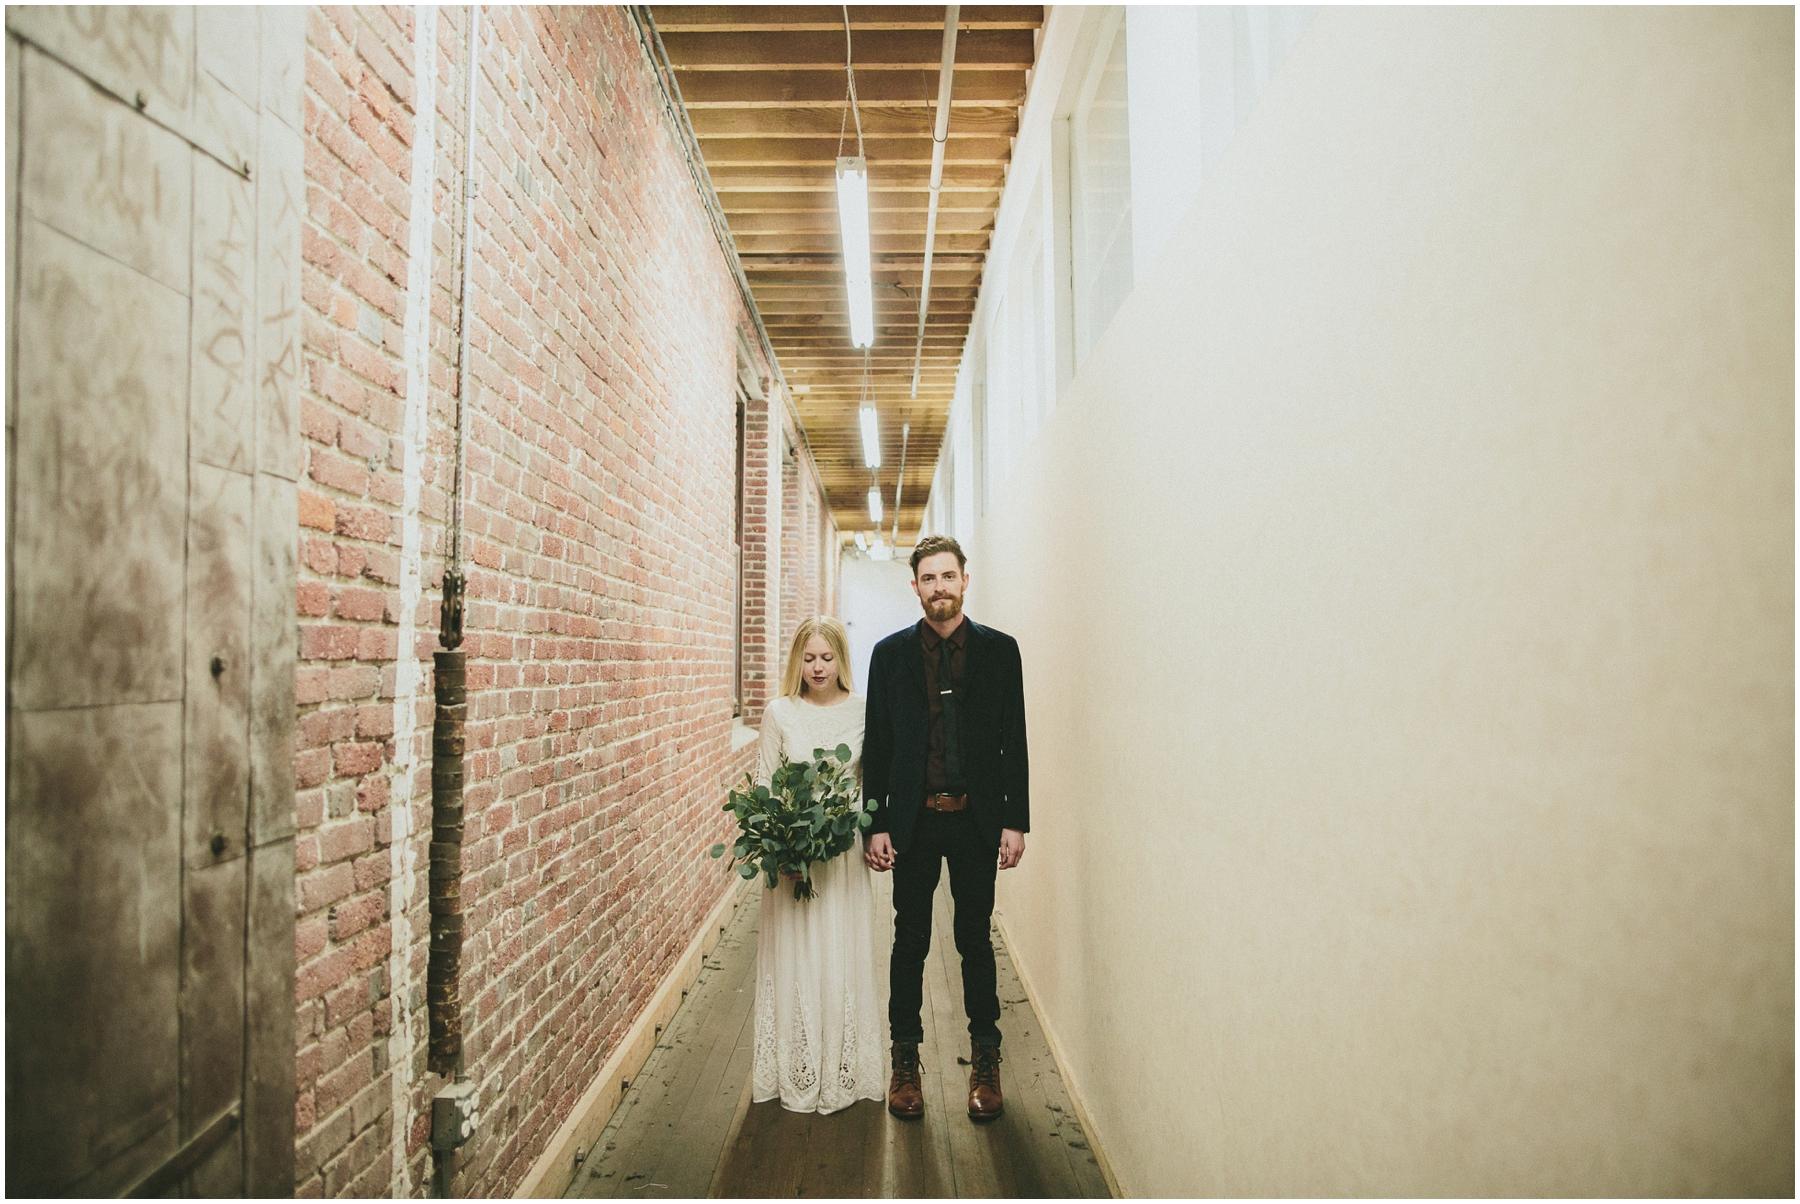 Natalie+Corey-WEDDING_KELLYBOITANO_0030